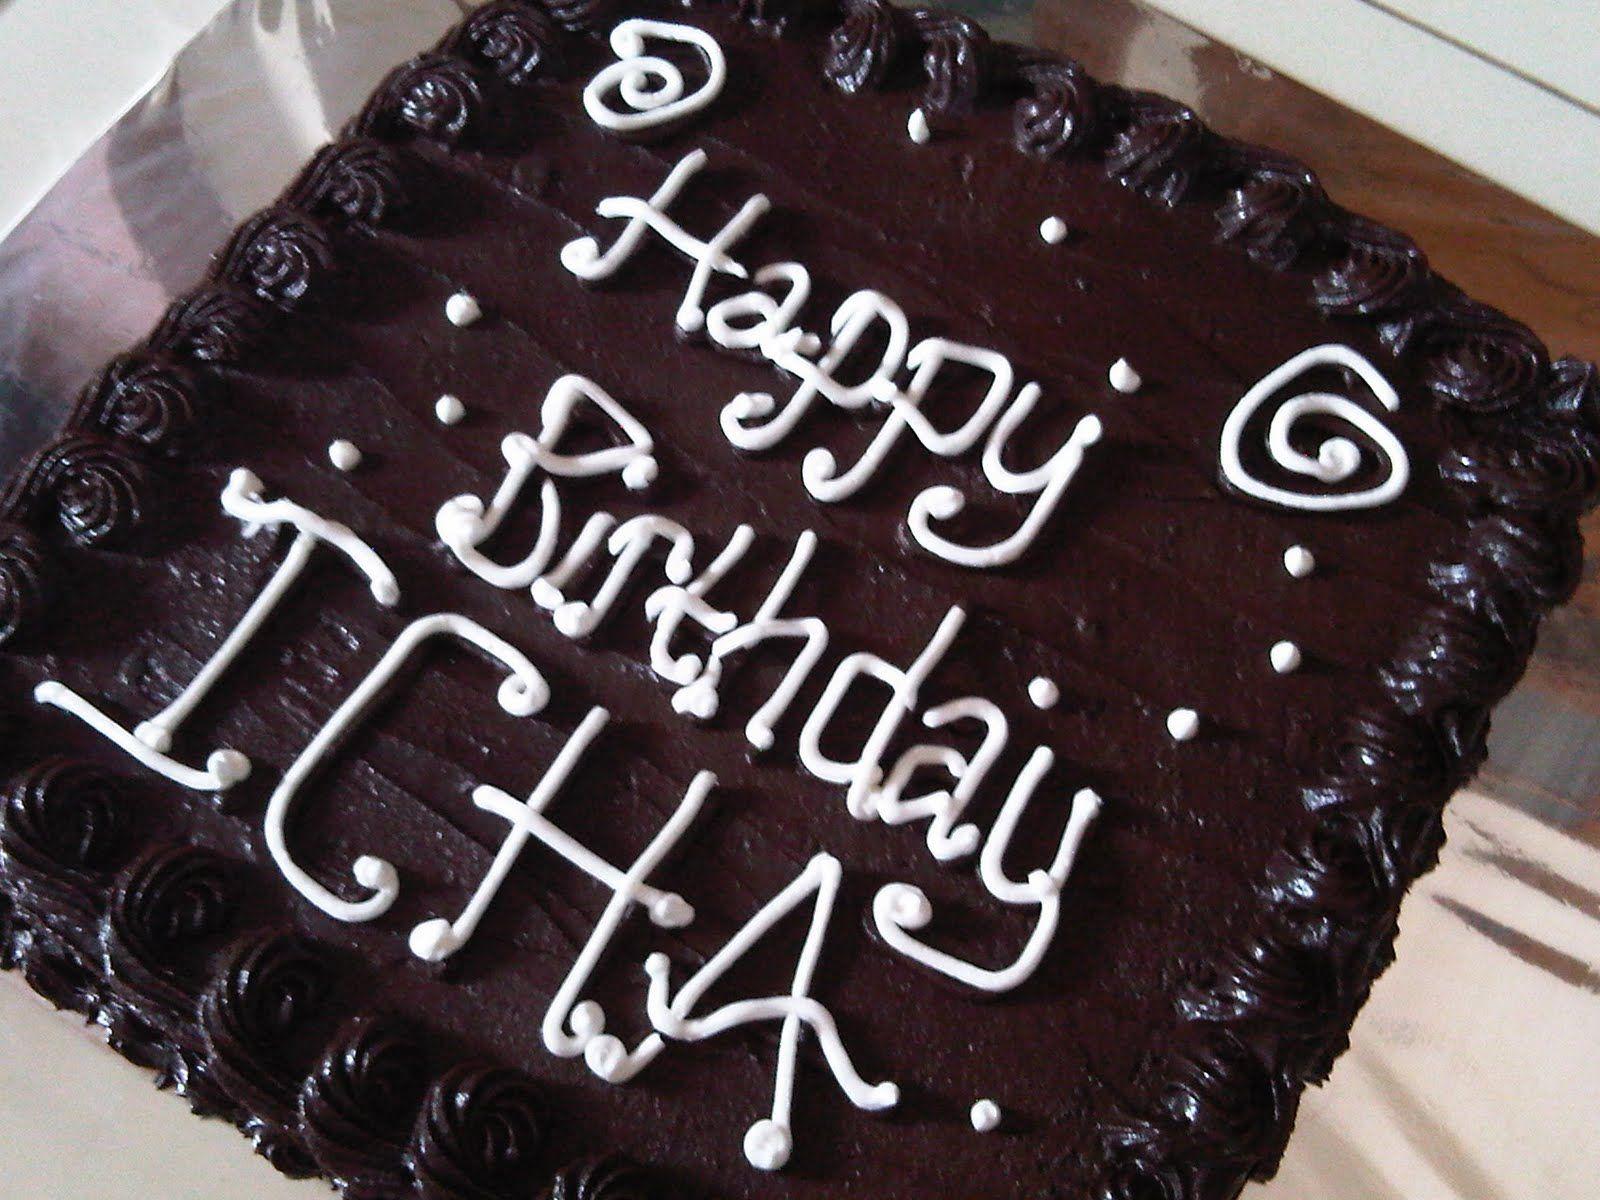 Kue Ulang Tahun Kue ulang tahun, Kue, Resep kue